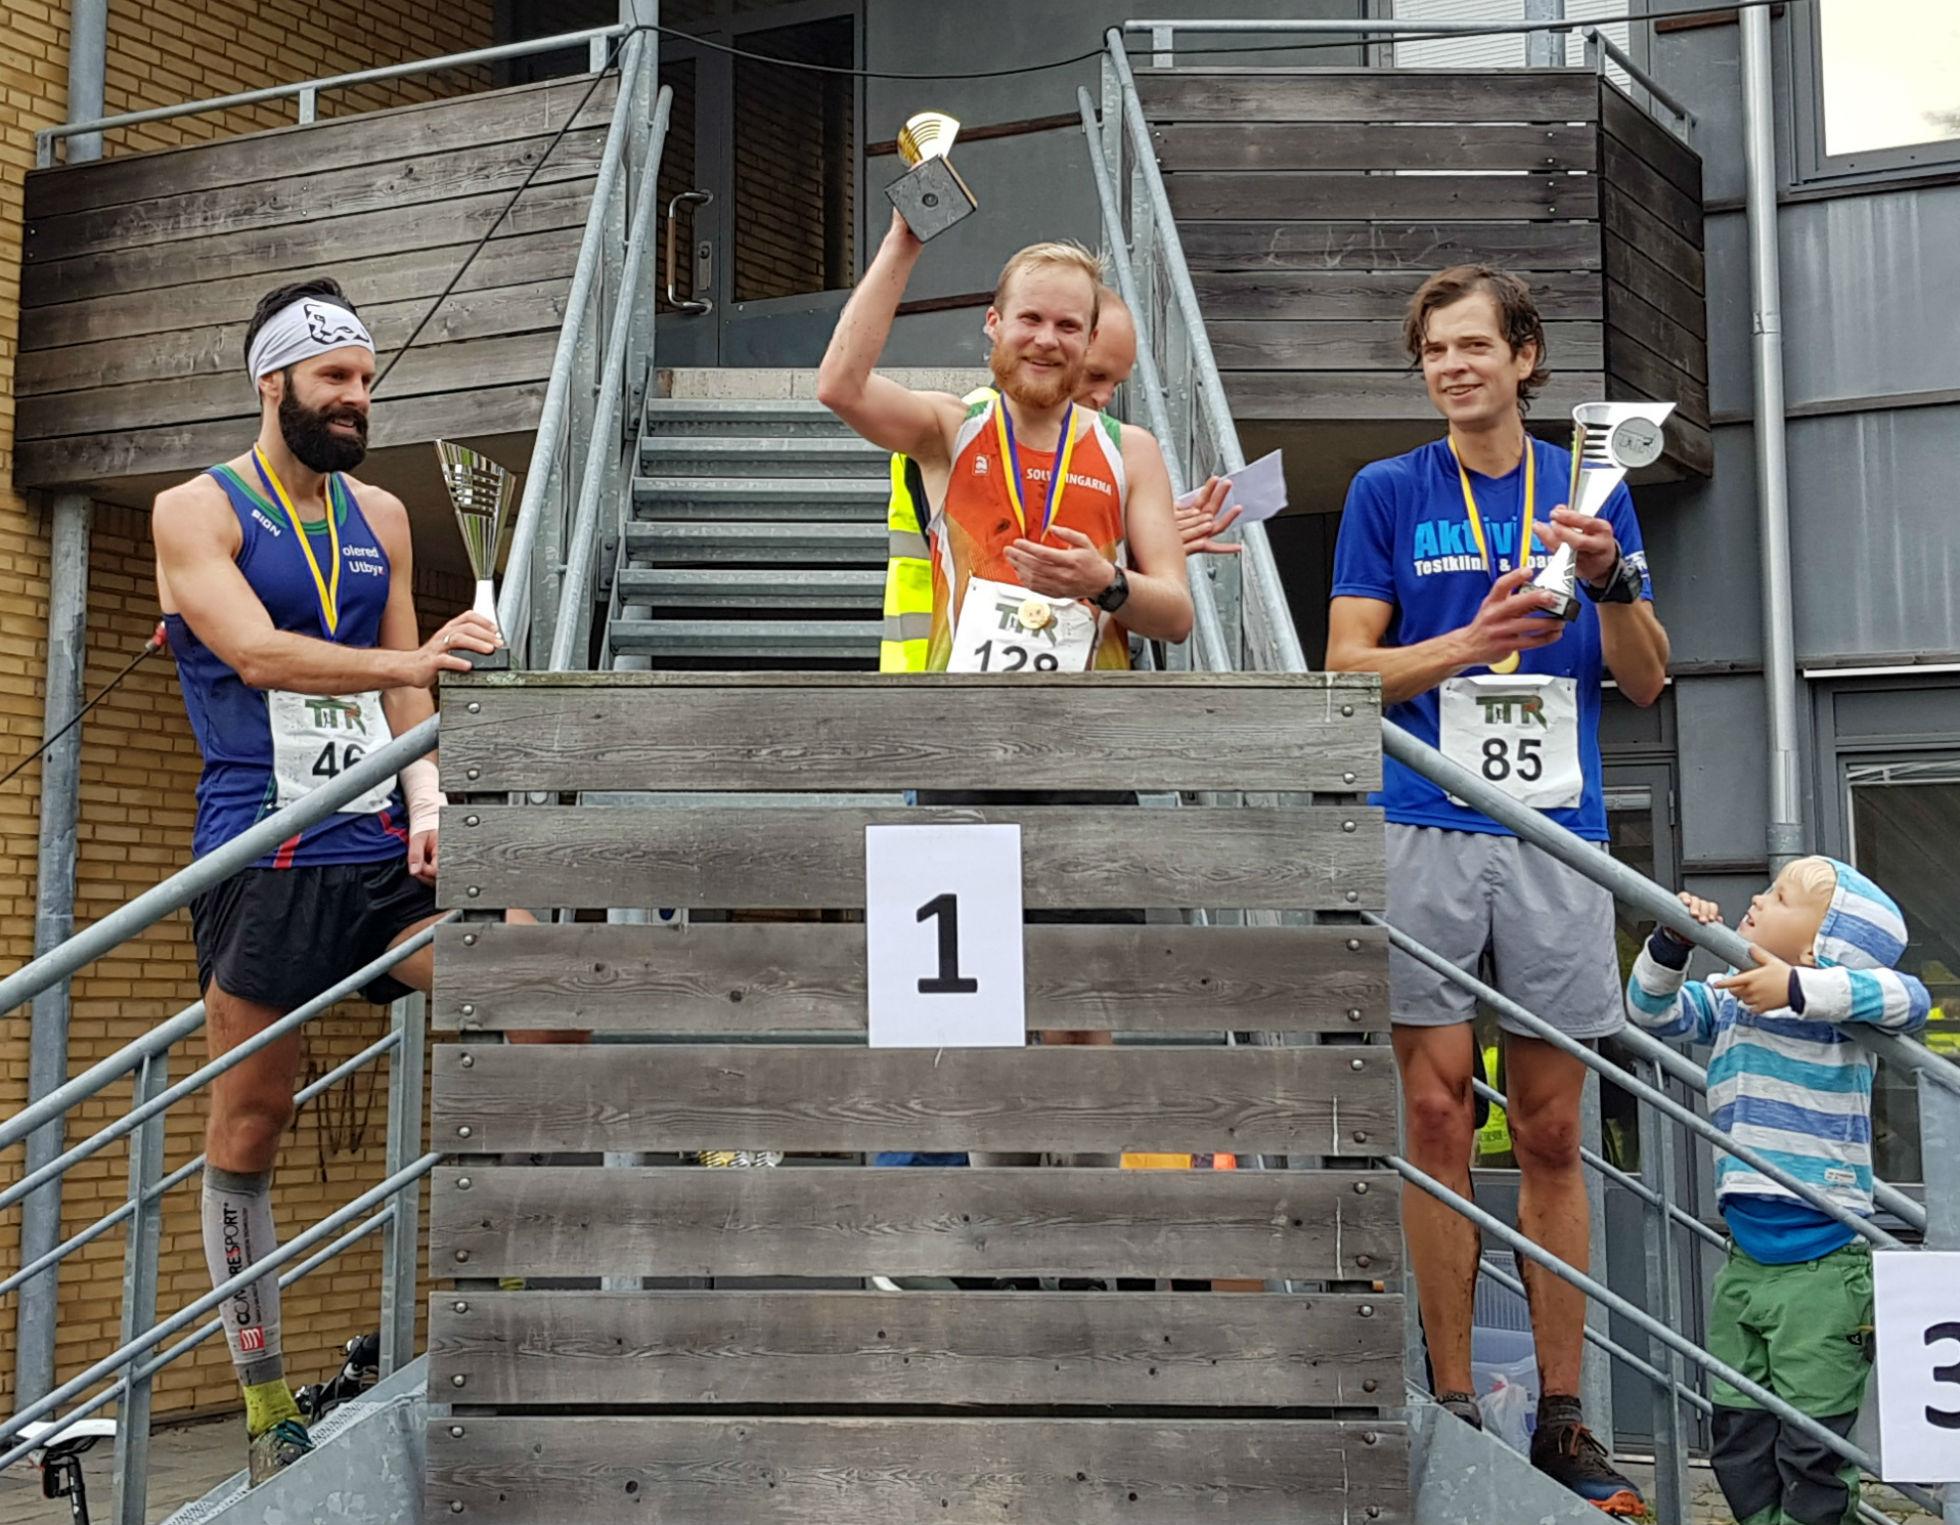 21,5km Herrar: 1:a Olle Dahlberg, 2:a Patrik Lindegårdh, 3:a Enar Andersson